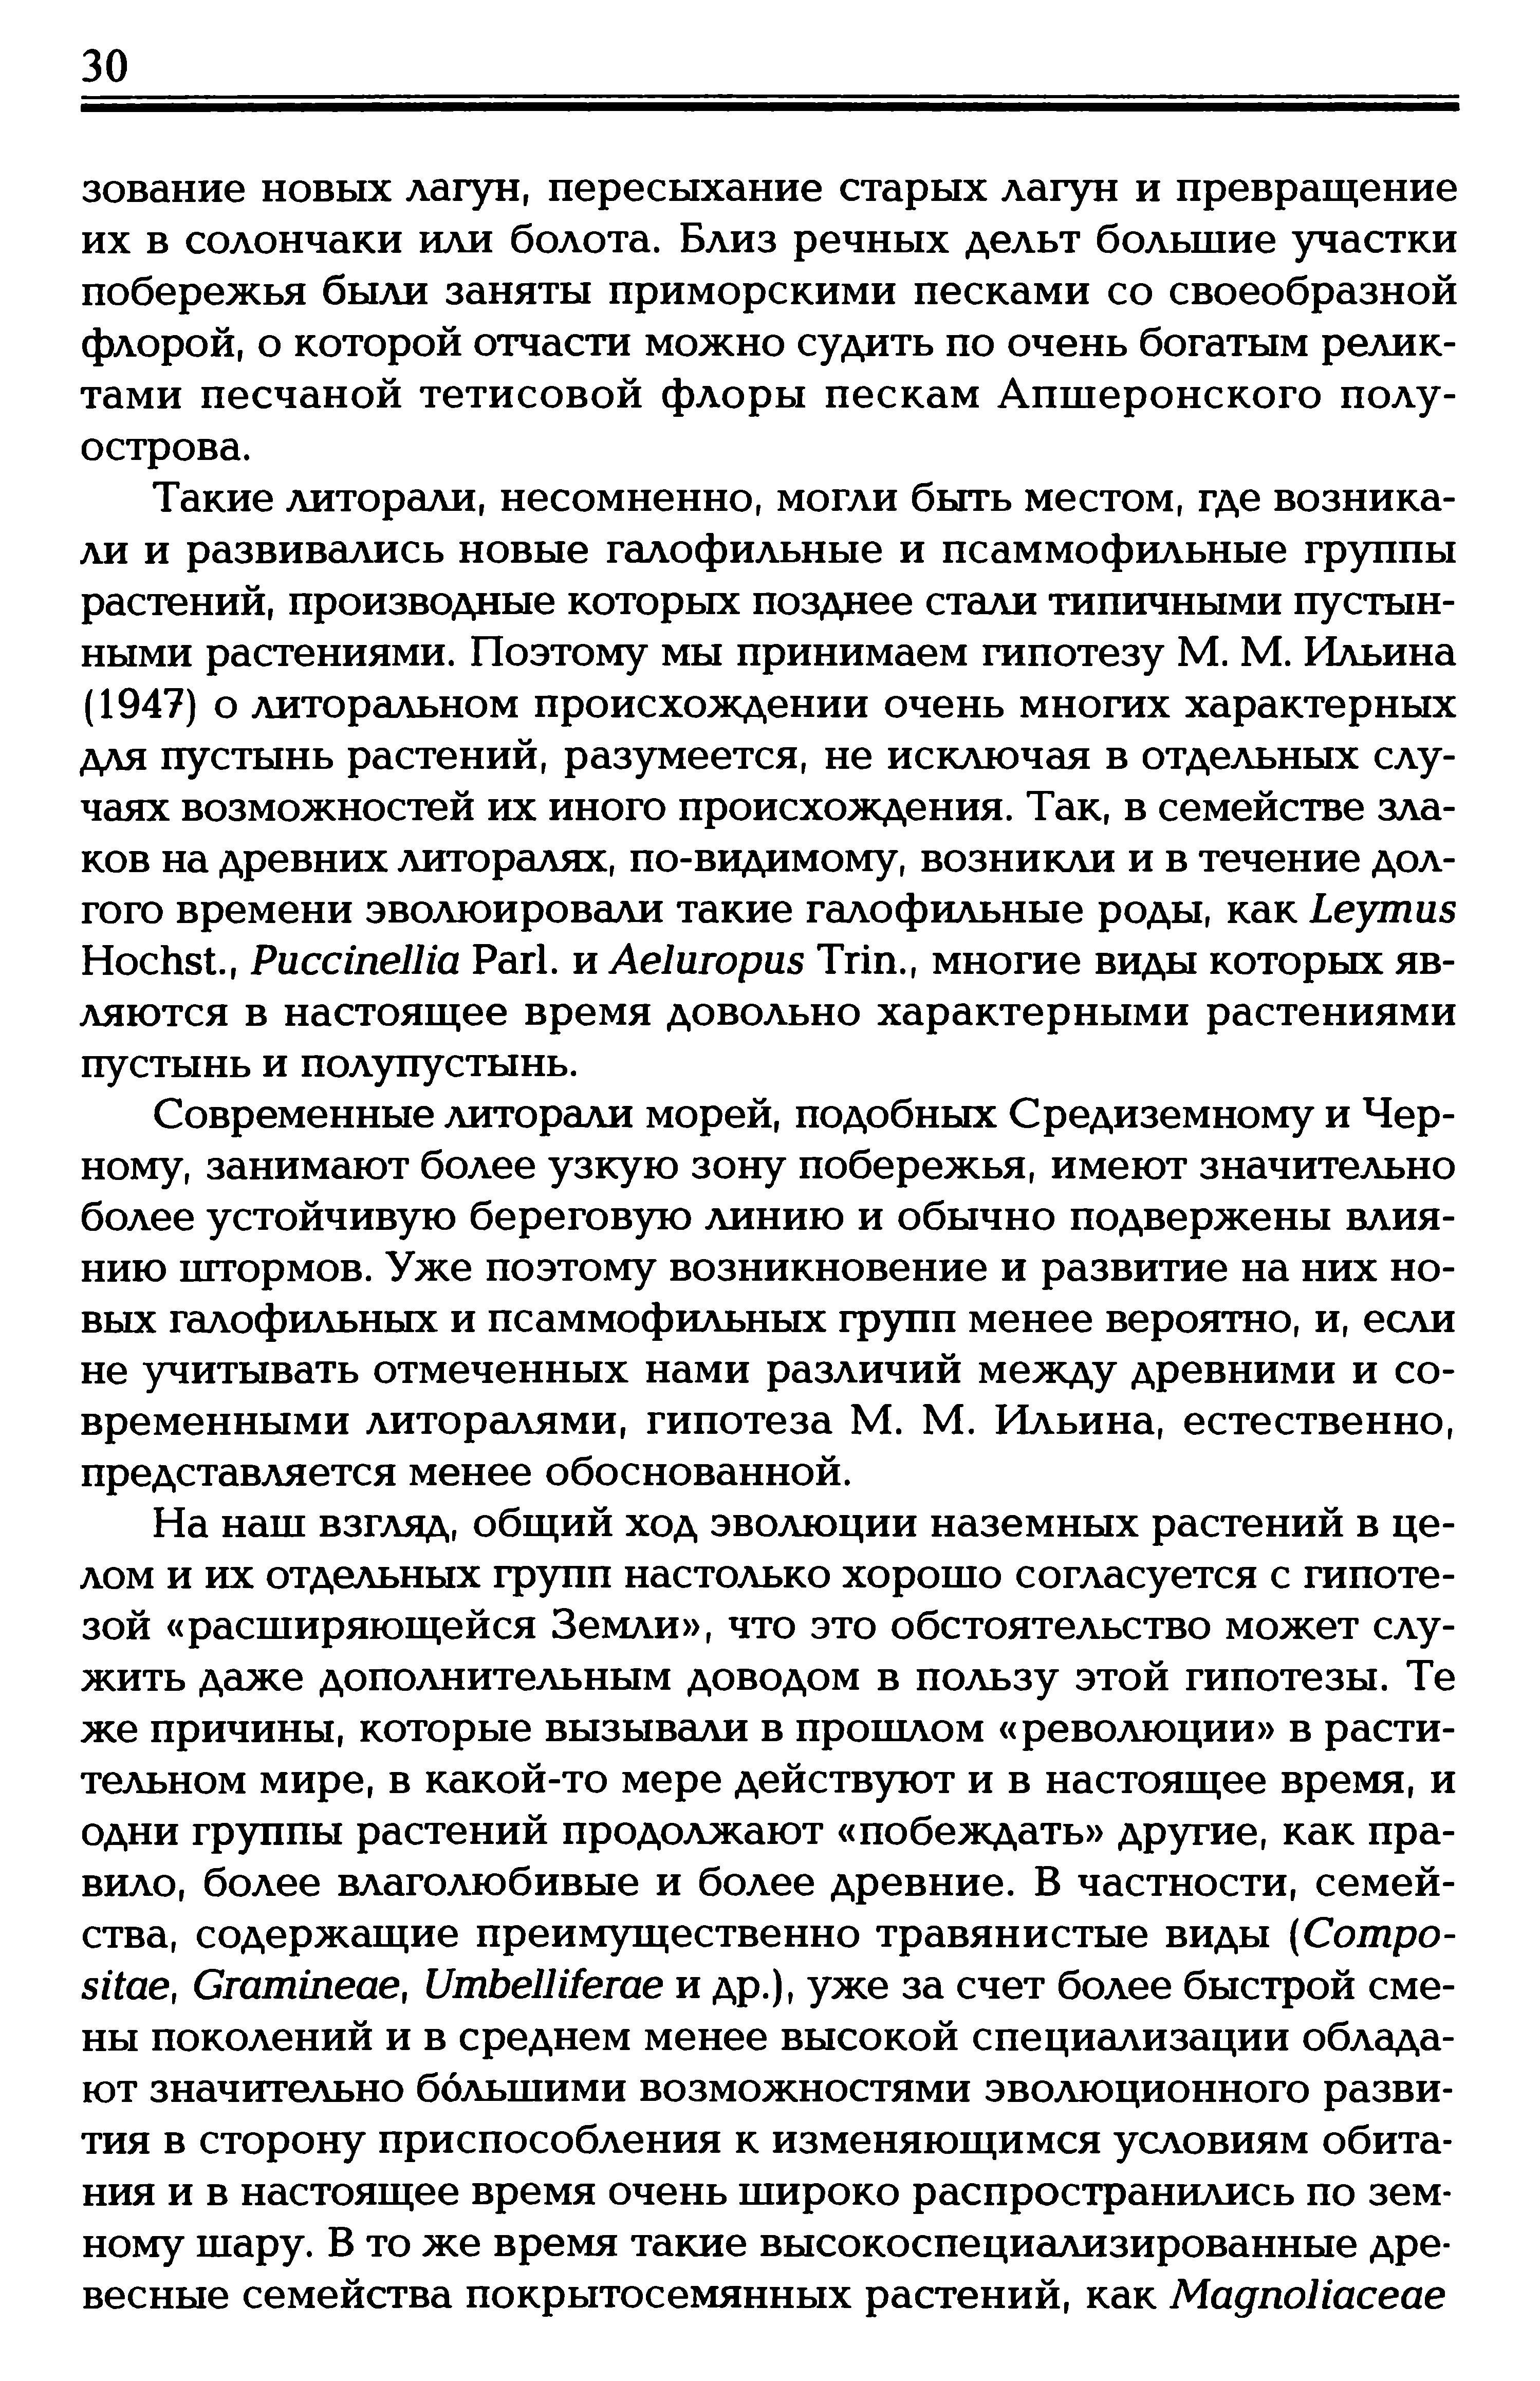 Tzvelev, 2005_1_11.jpeg